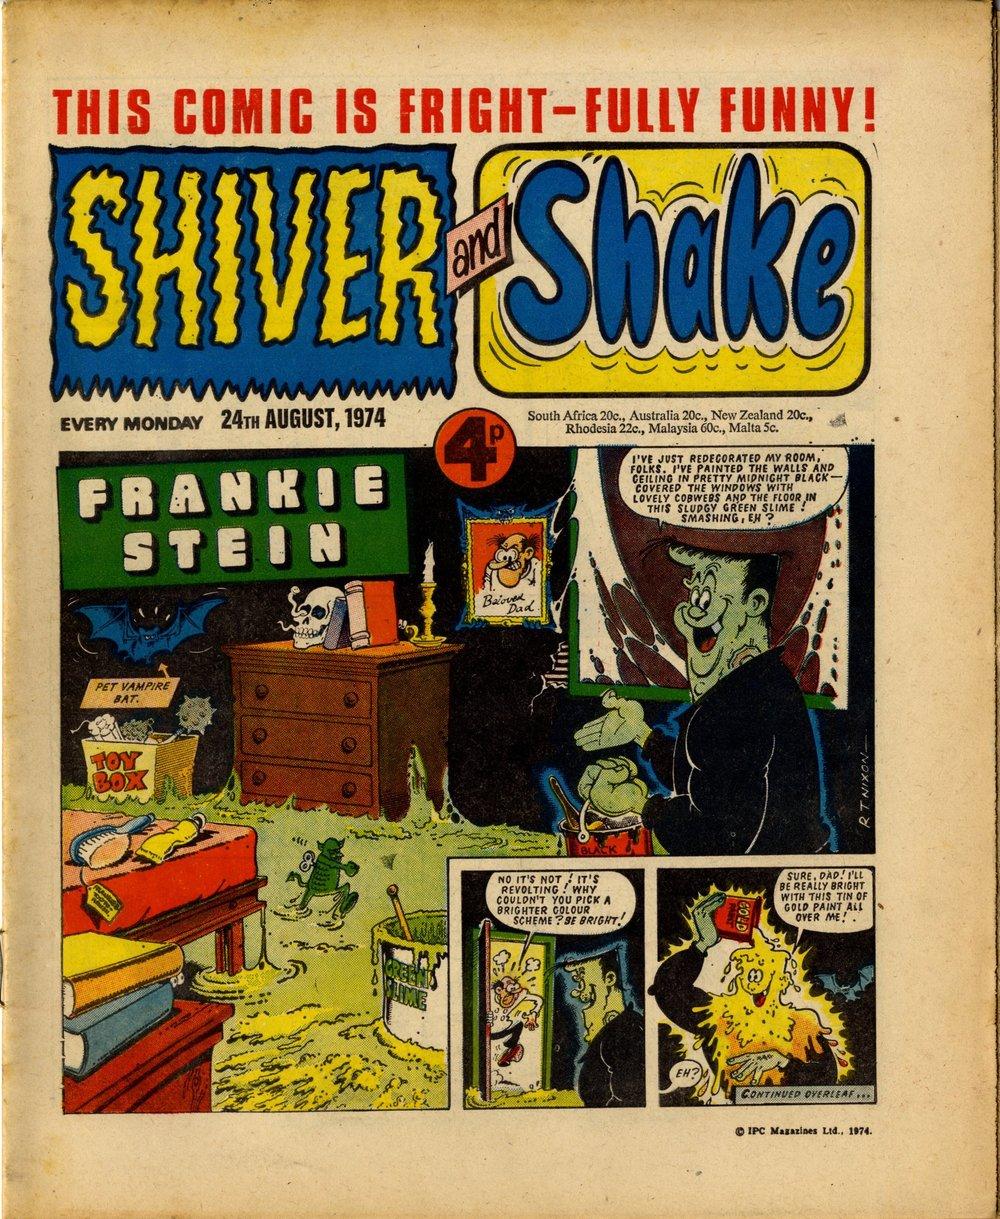 24 August 1974: Shiver and Shake (Frankie Stein: Robert Nixon (artist))